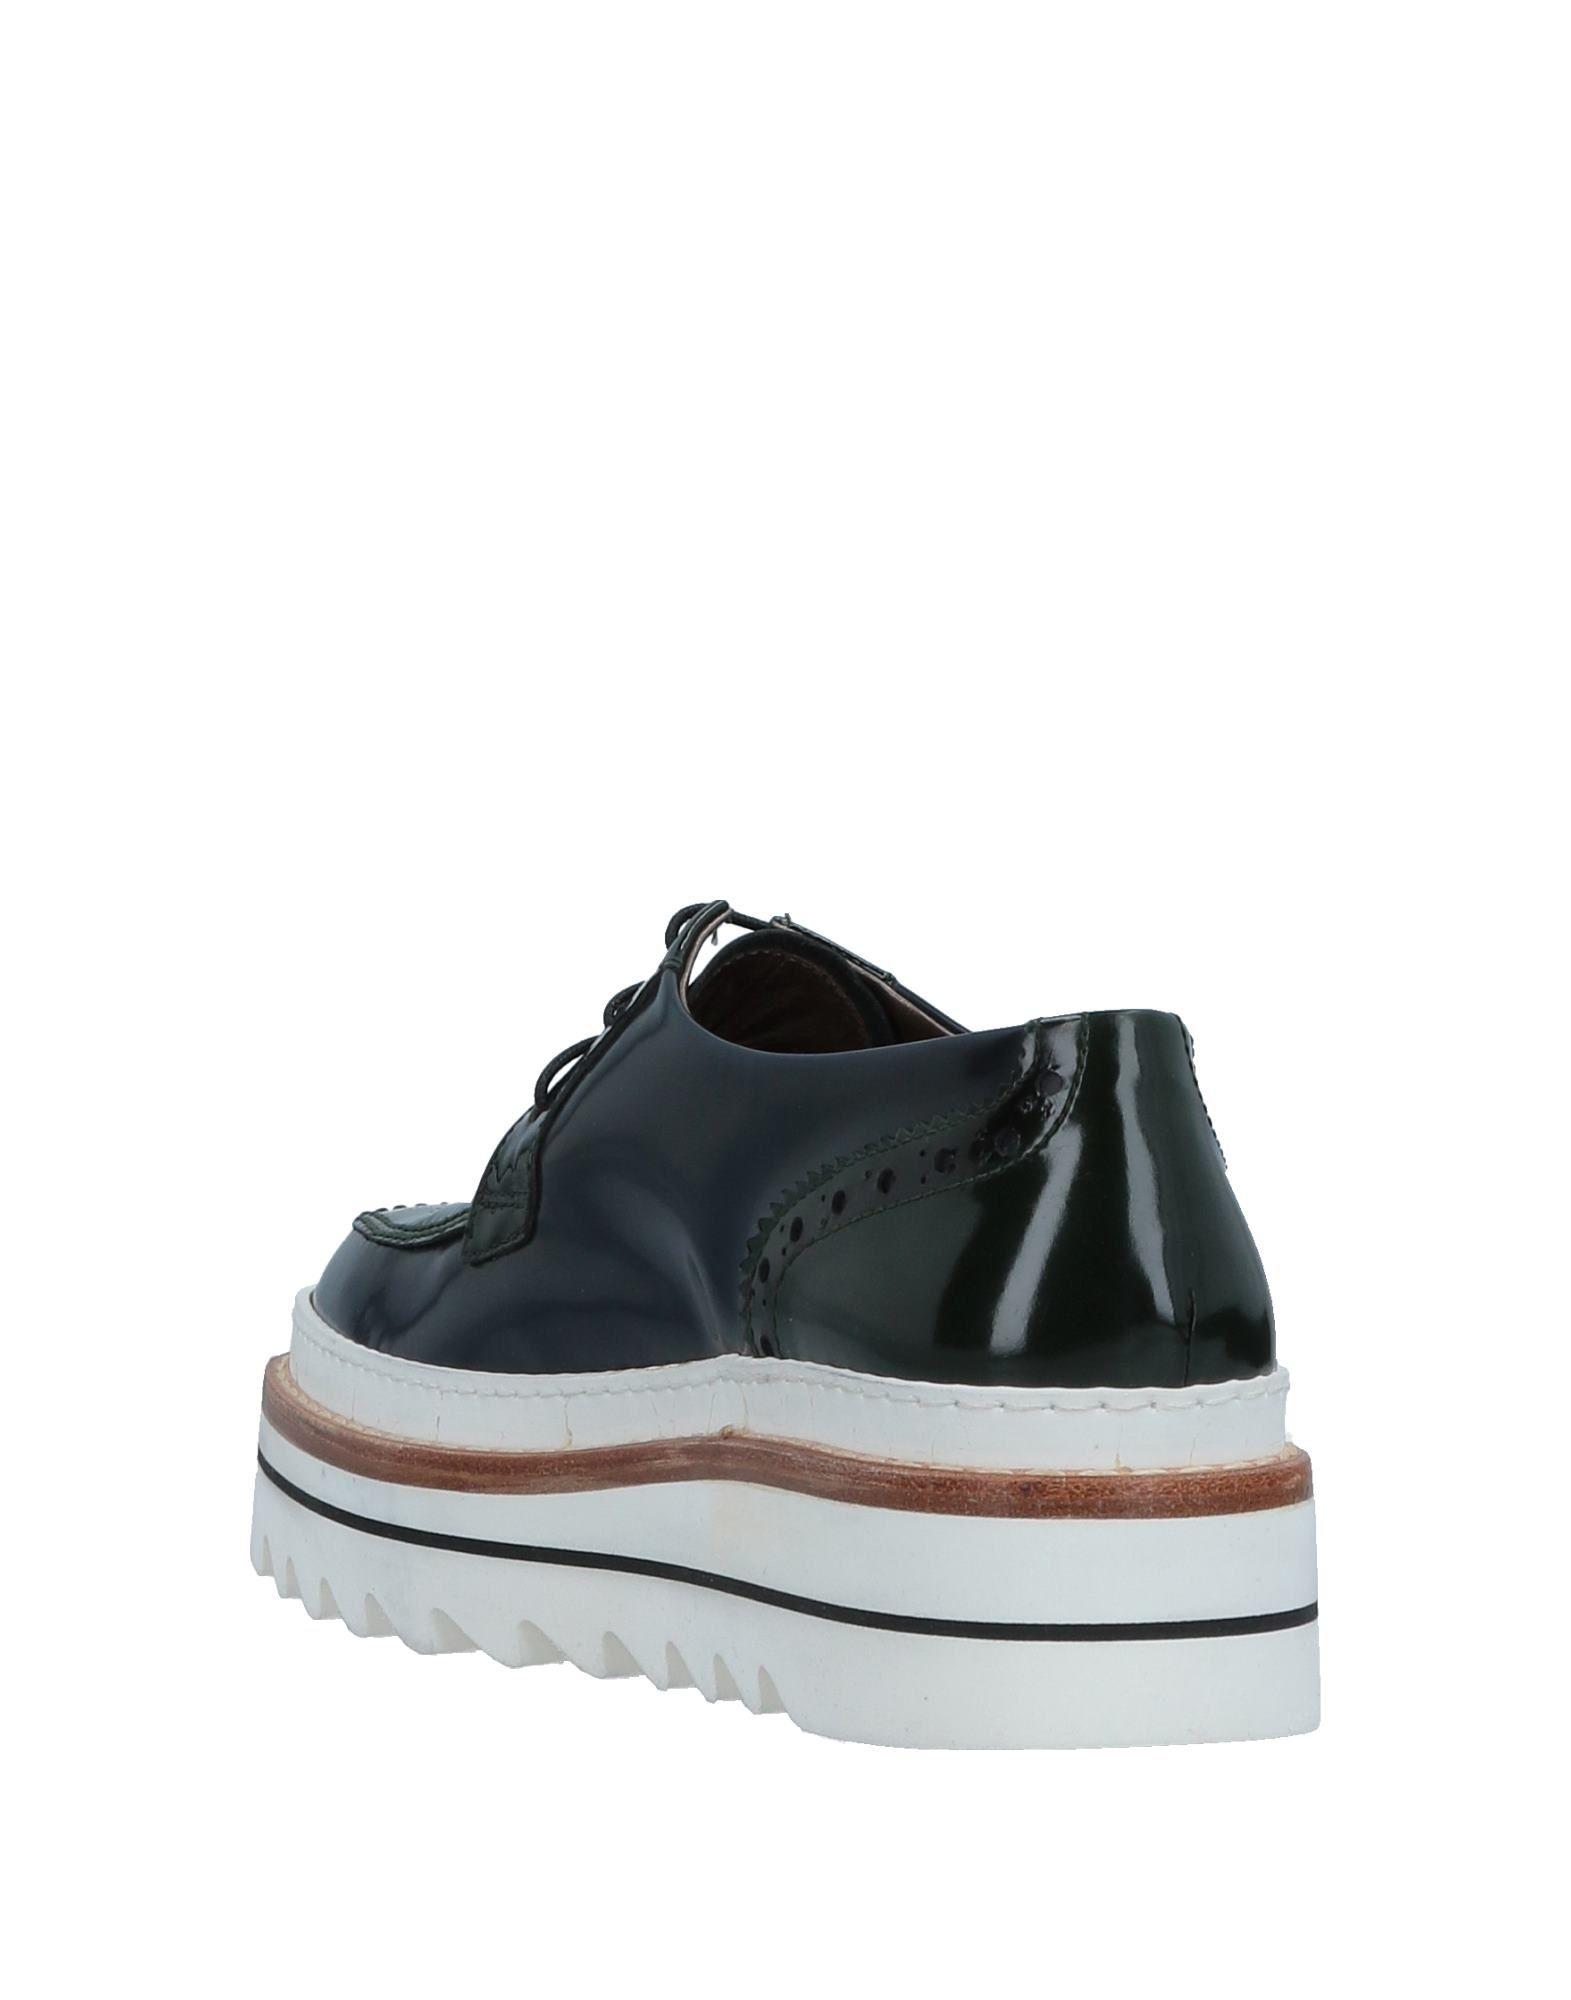 Stilvolle billige  Schuhe Barracuda Schnürschuhe Damen  billige 11518406BH a56030